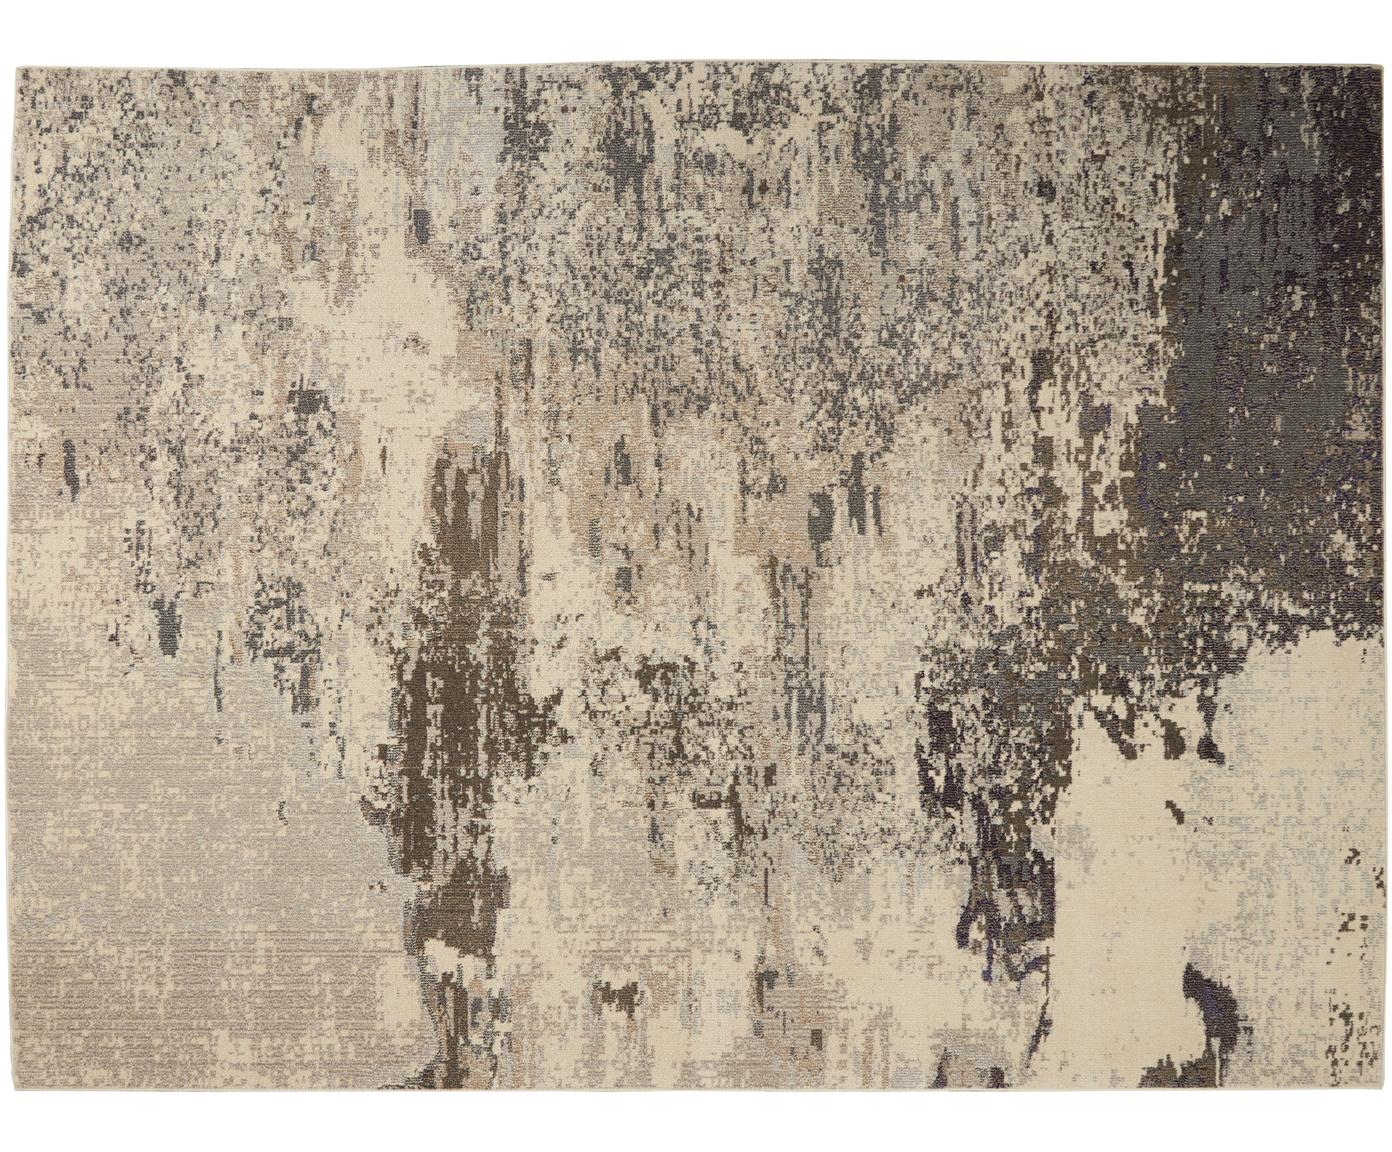 Tappeto fantasia a pelo corto Celestial, Vello: polipropilene, Retro: juta, Tonalità beige, Larg. 120 x Lung. 180 cm (taglia S)